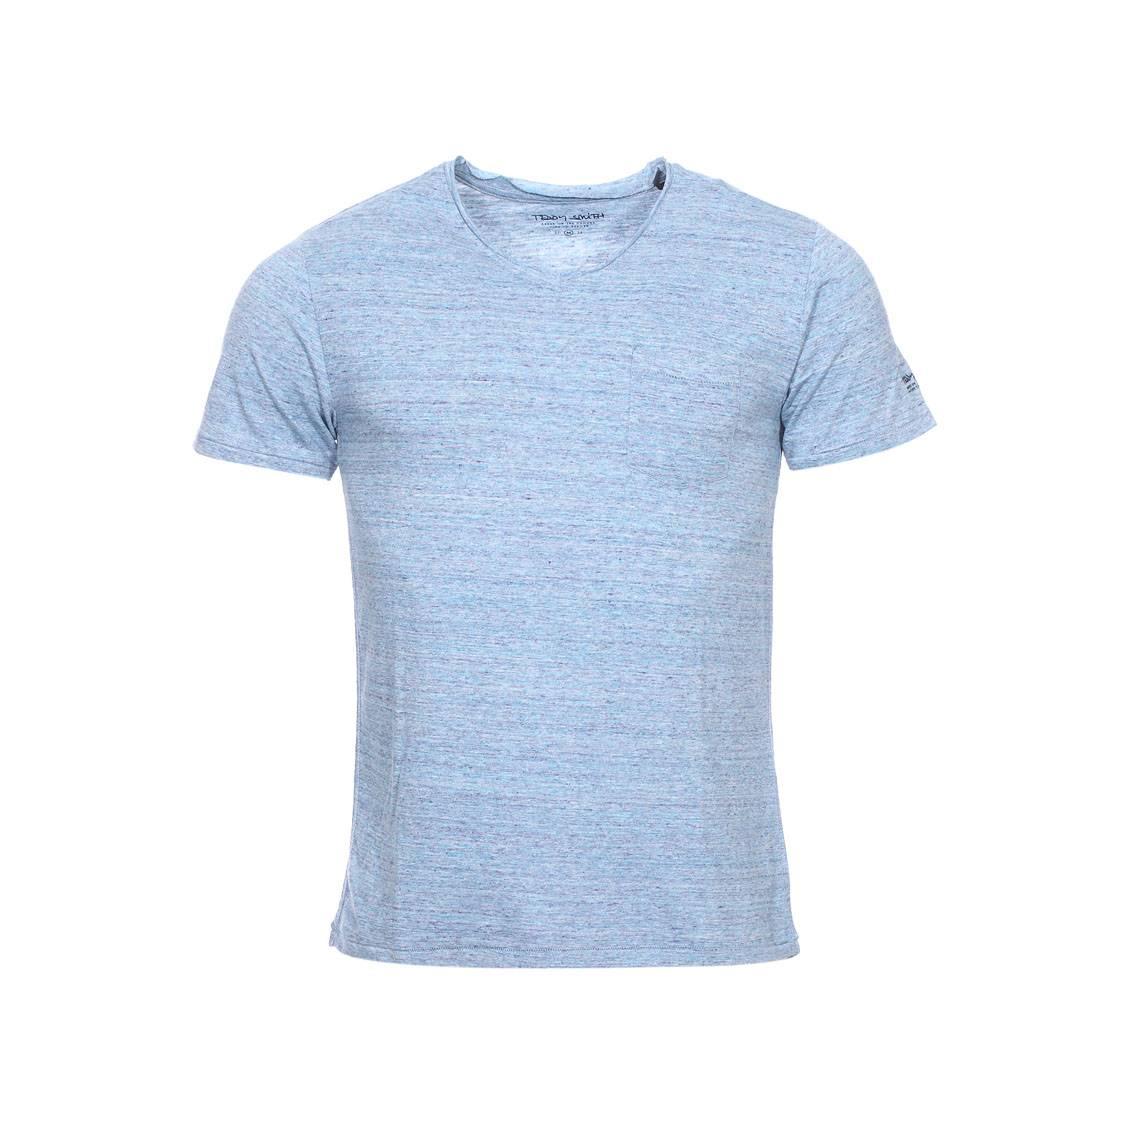 439b76a78b Tee-shirt col V Teddy Smith Tbill en coton mélangé bleu azur   Rue ...